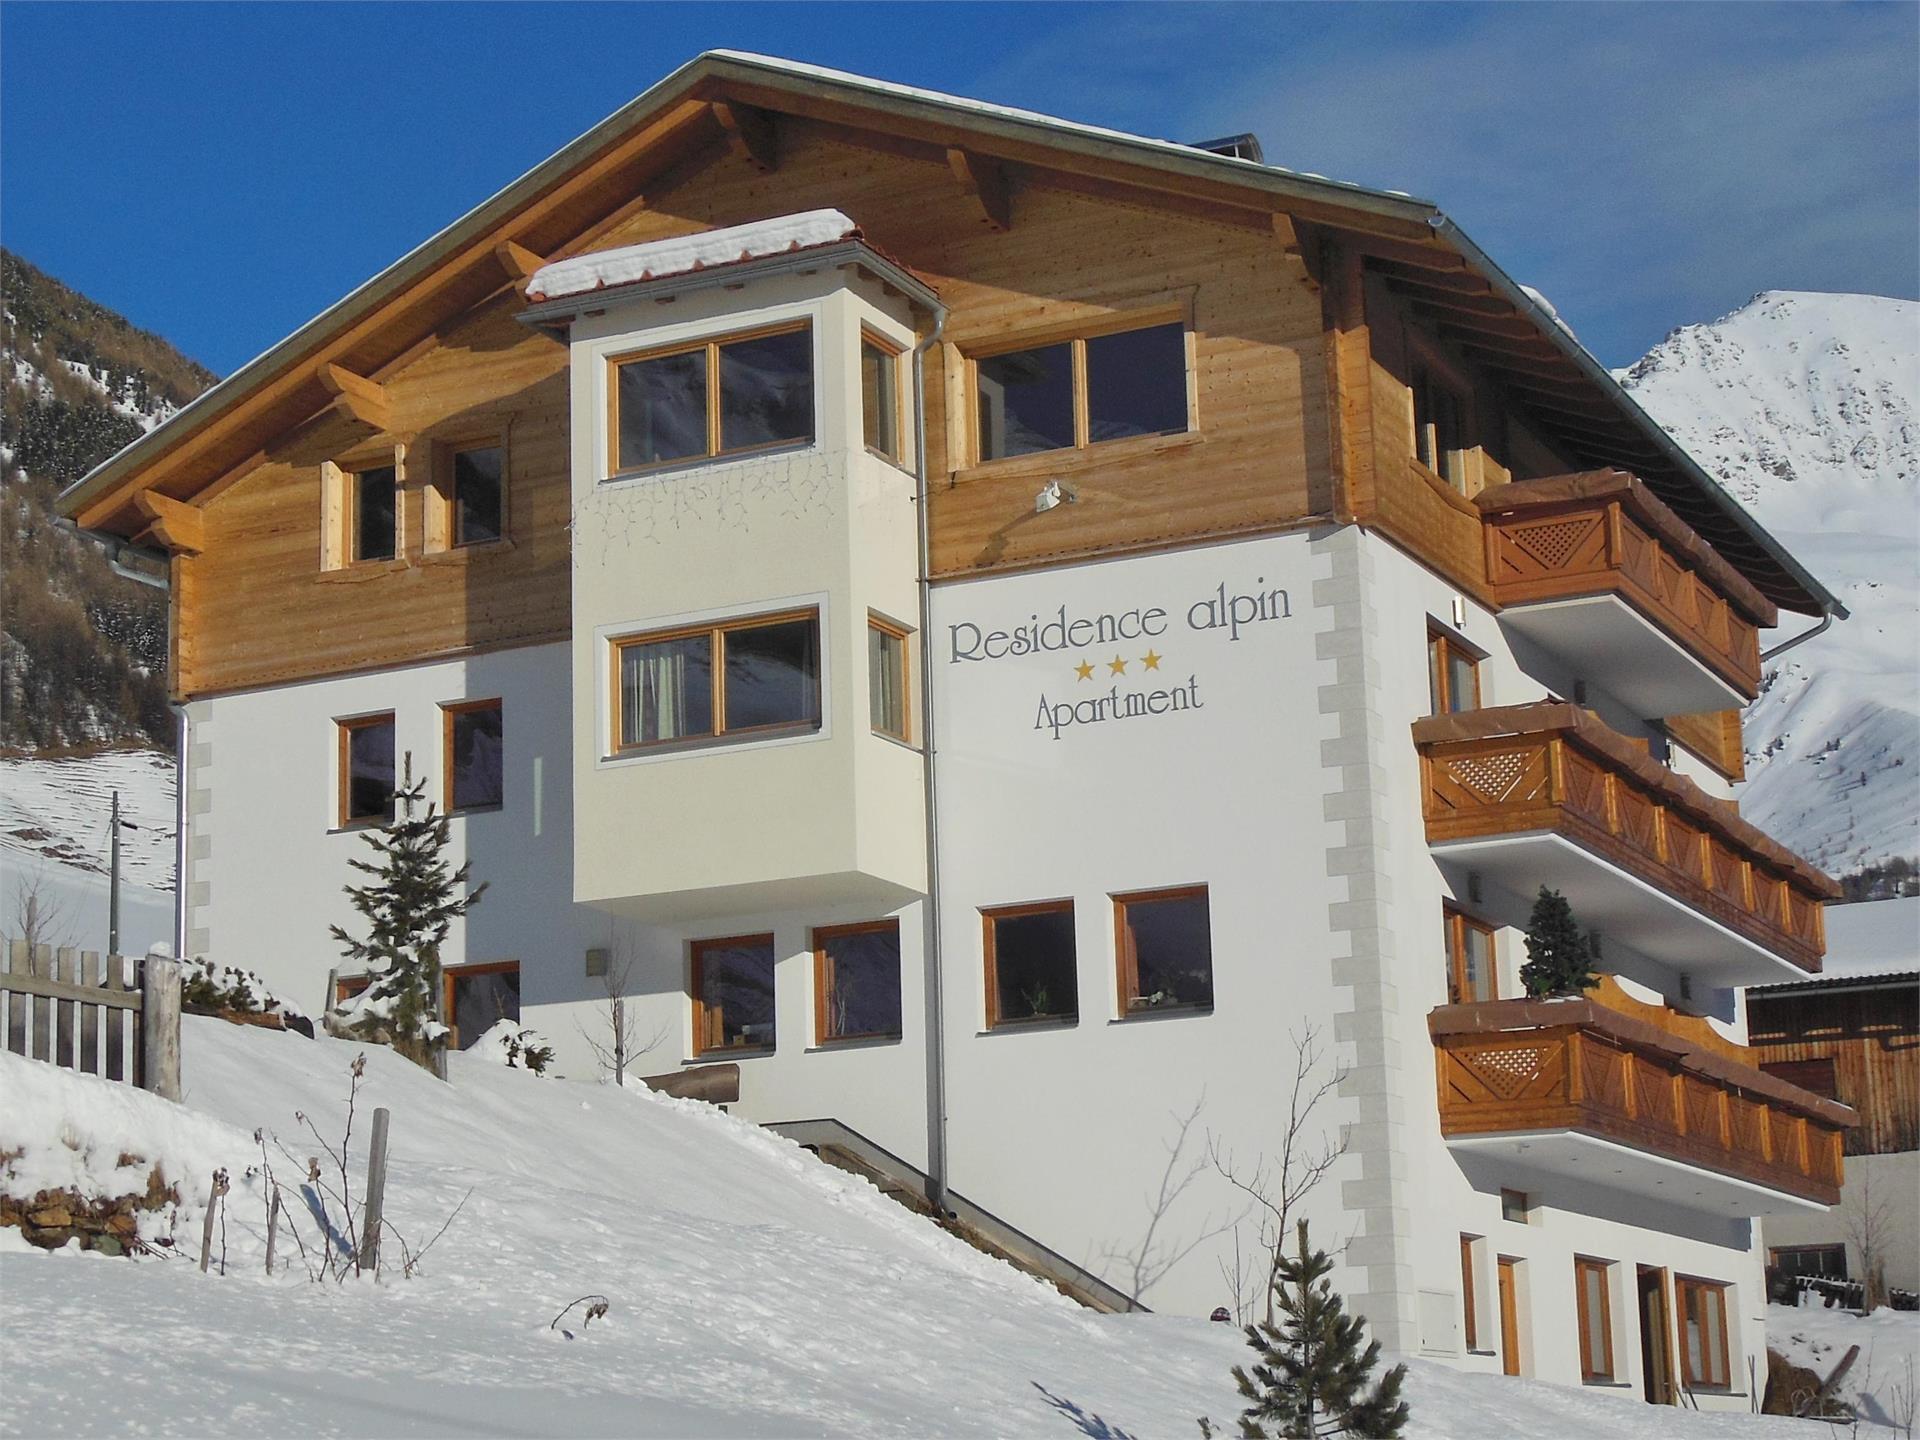 Residence Alpin